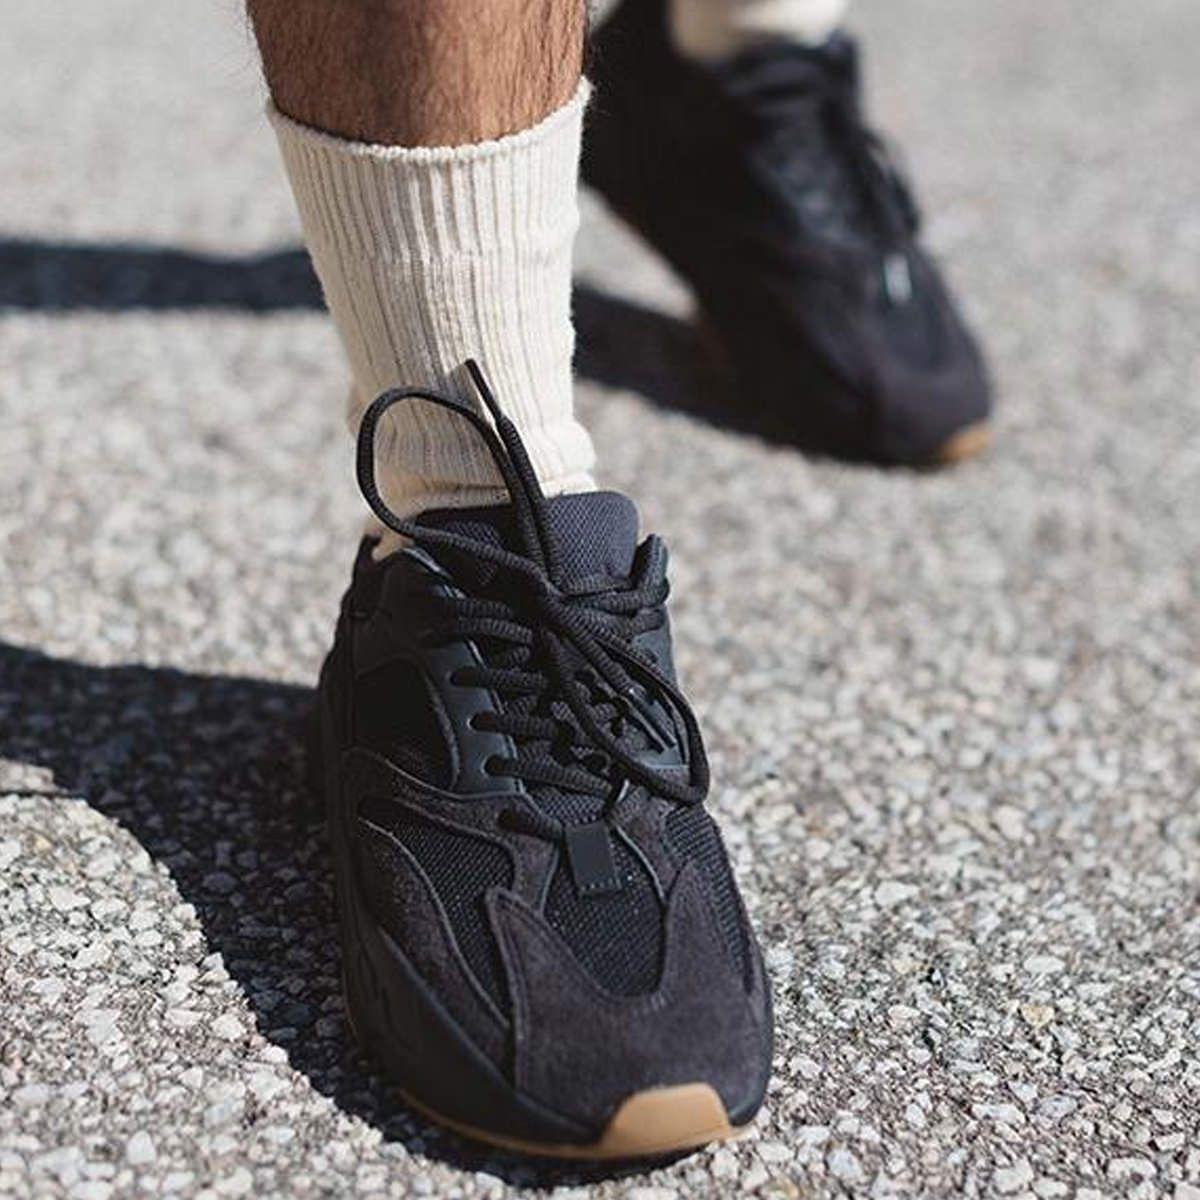 yeezy utility black 700 on feet